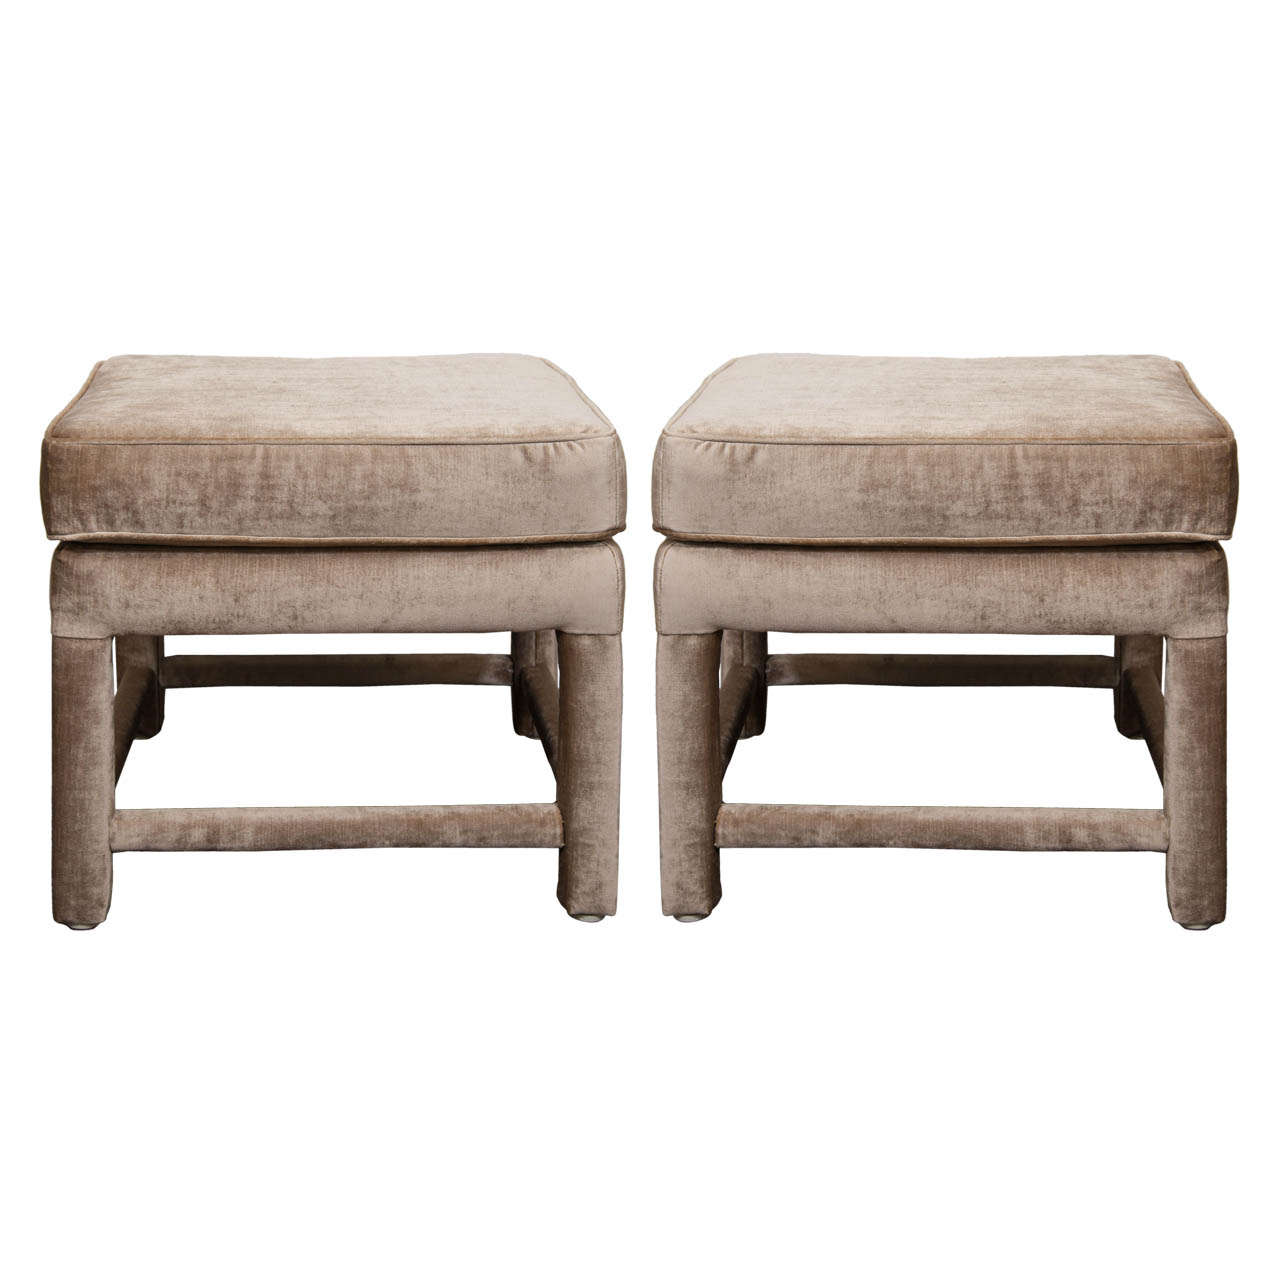 a mid century pair of champagne velvet upholstered benches at stdibs - a mid century pair of champagne velvet upholstered benches